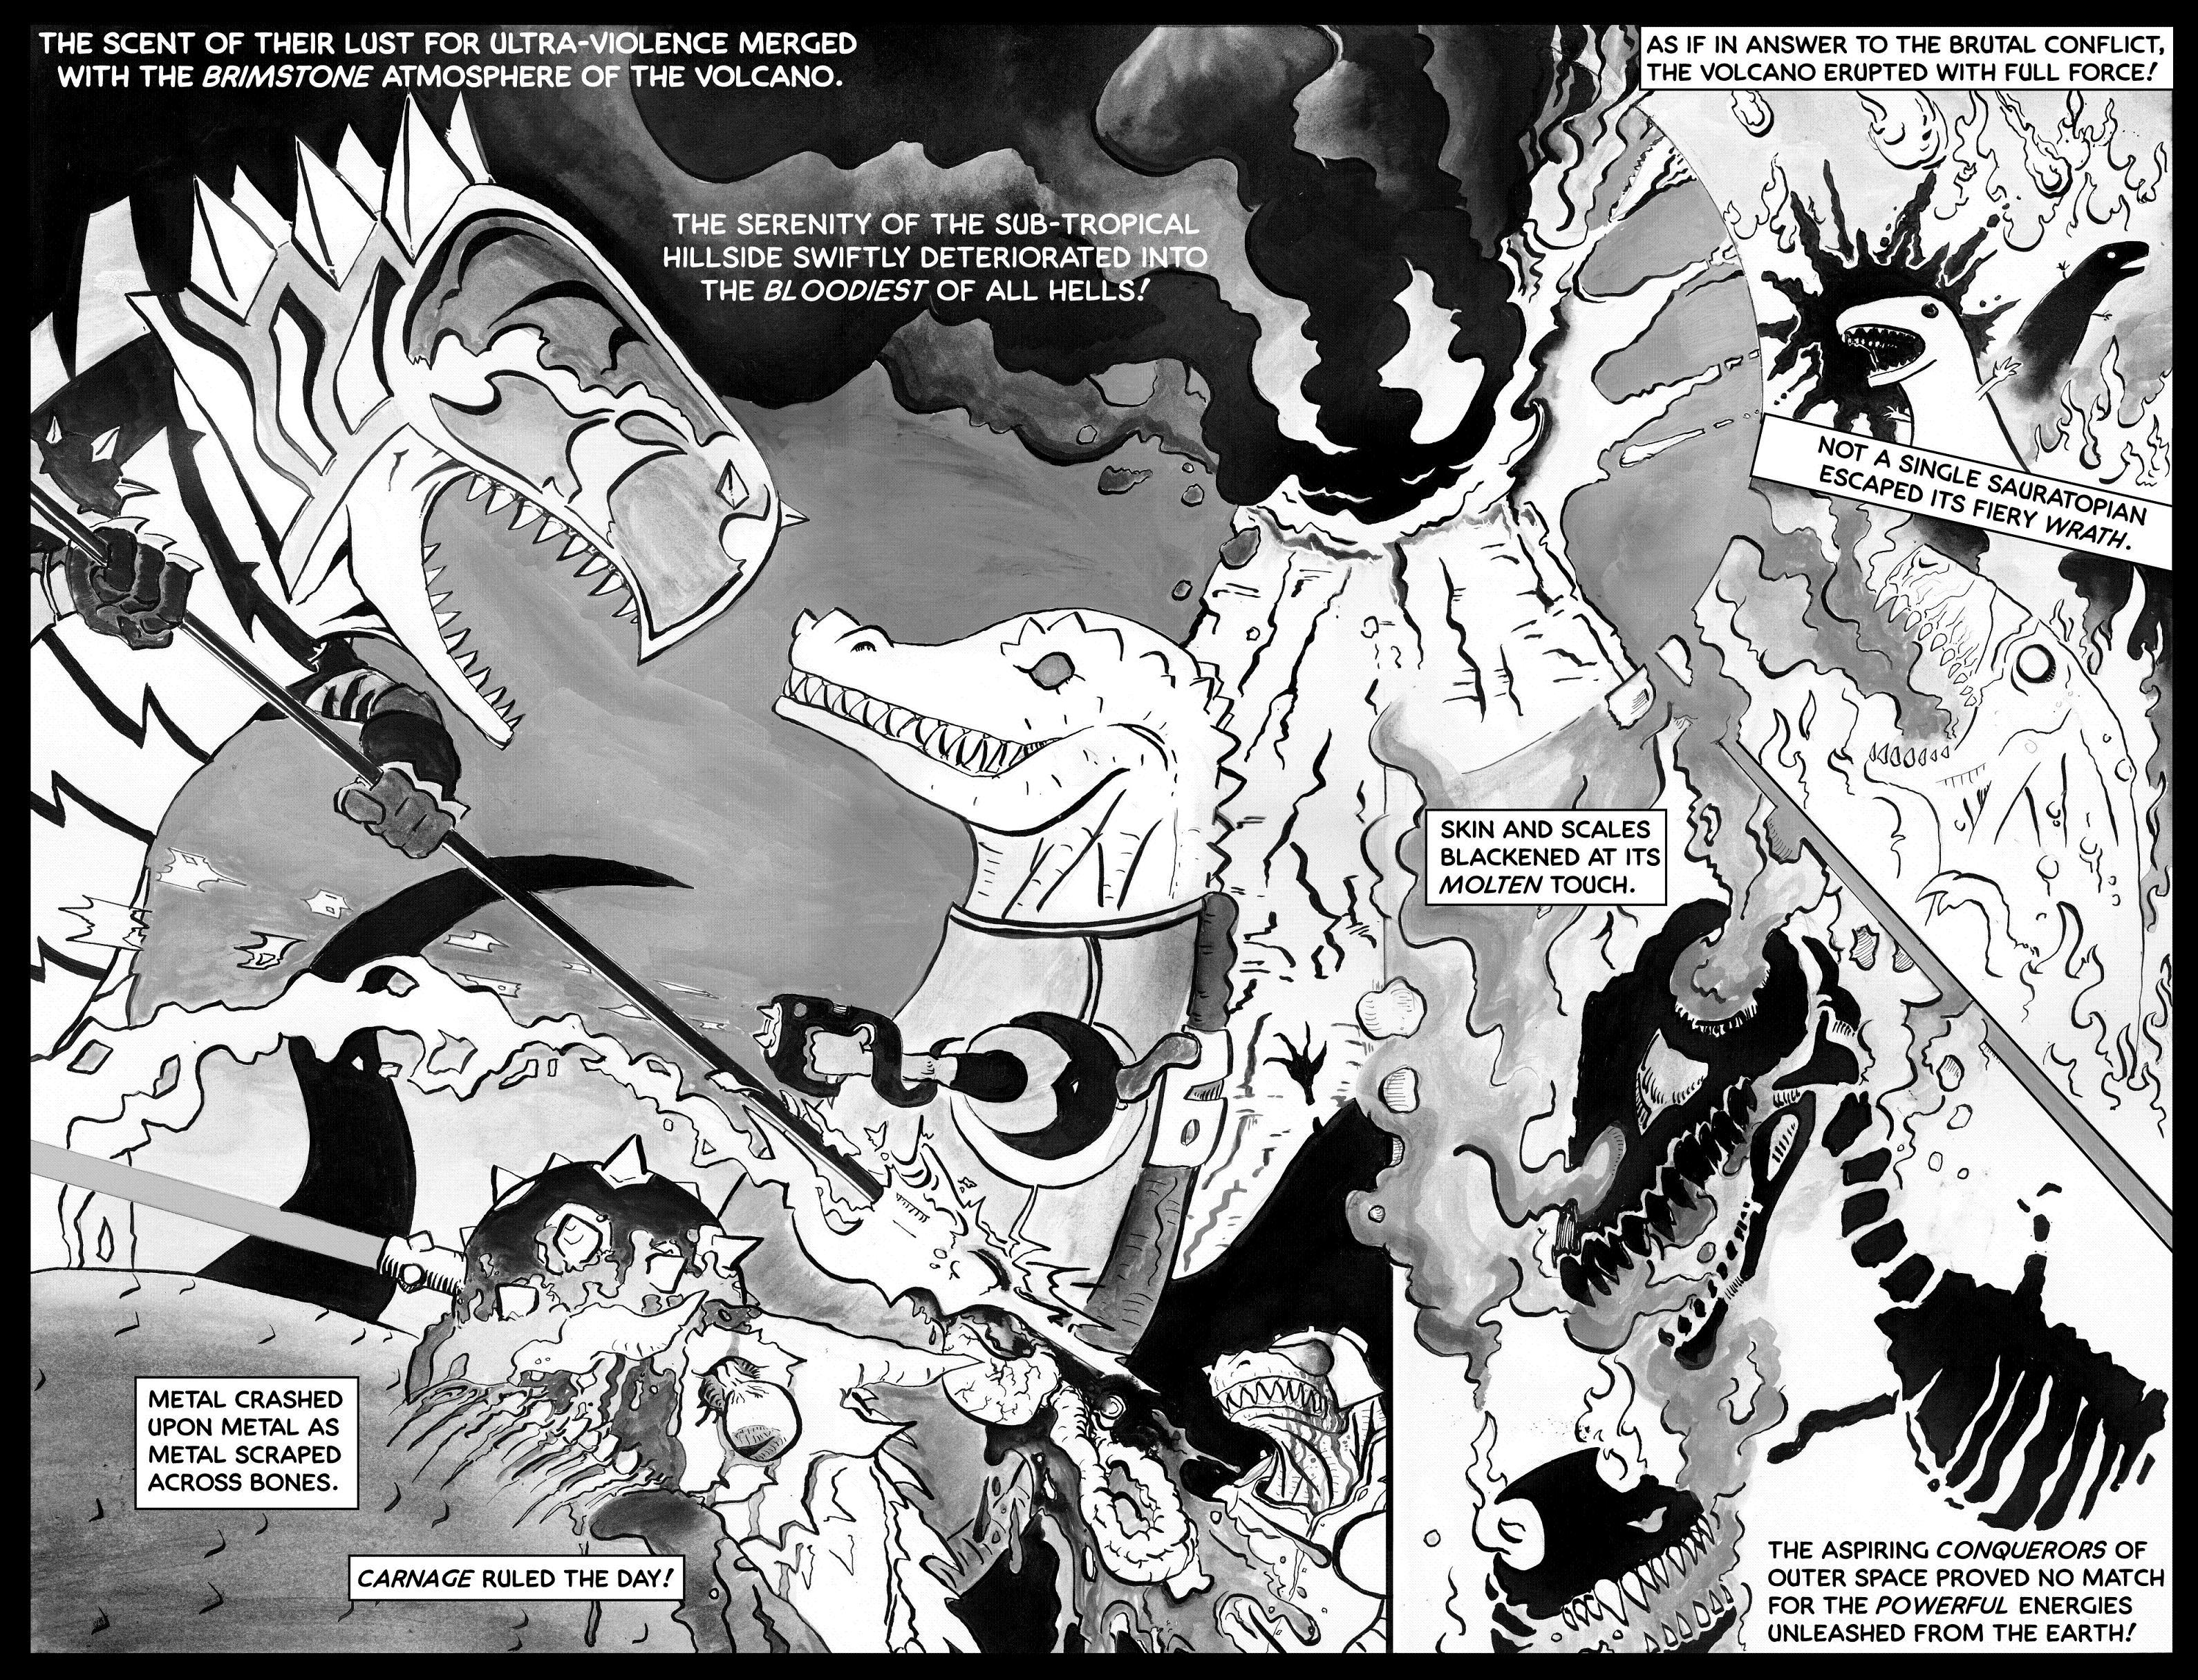 6 Sauratopia pg 4-5 double splash